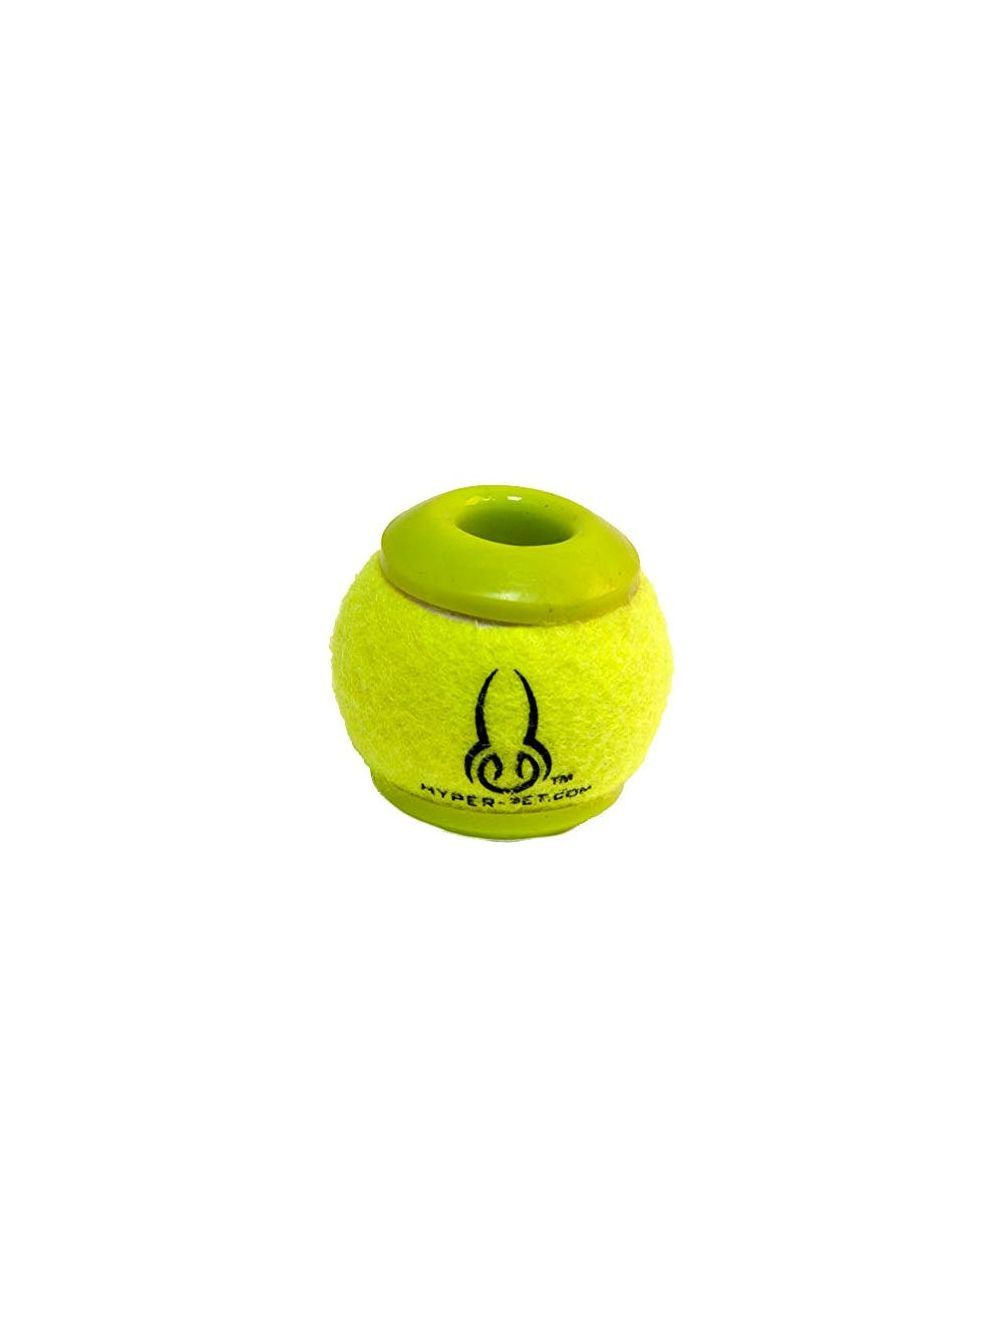 Hyper pet lanzador pro repuesto pelota - Ciudaddemascotas.com